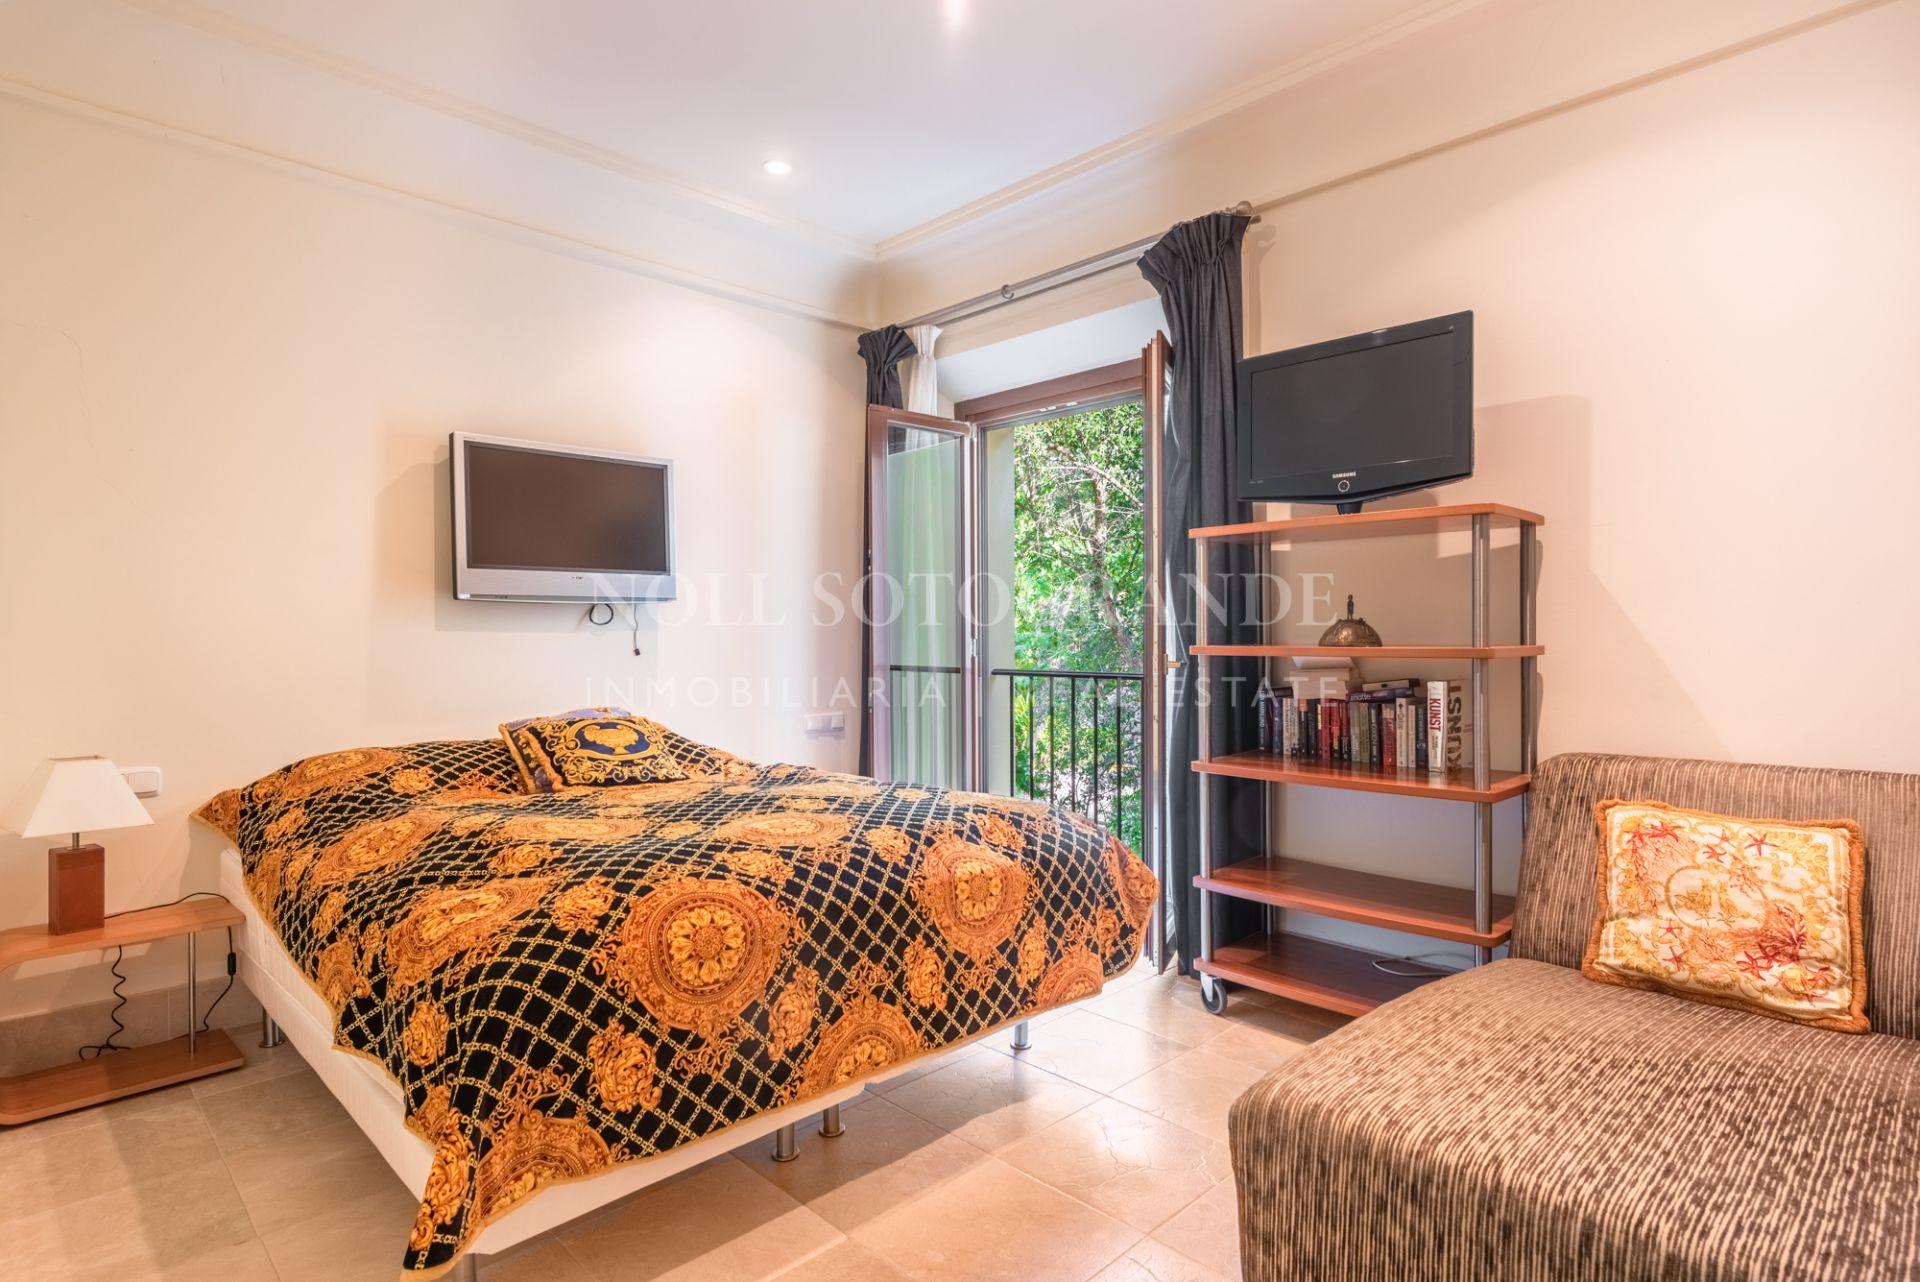 Sotogrande, Valgrande - three bedroom apartment for sale